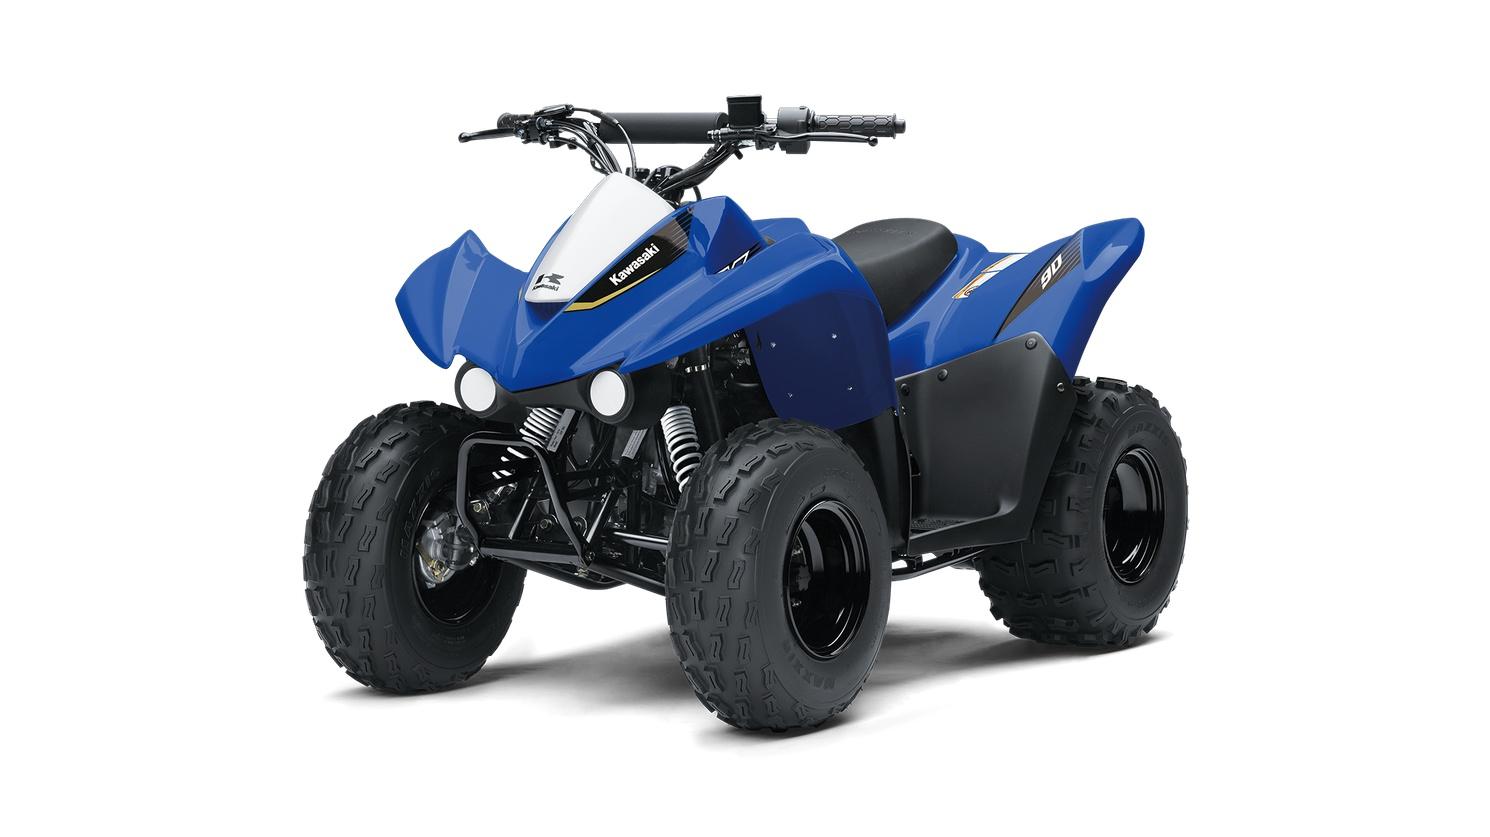 Kawasaki KFX90 Bleu Vibrant 2020